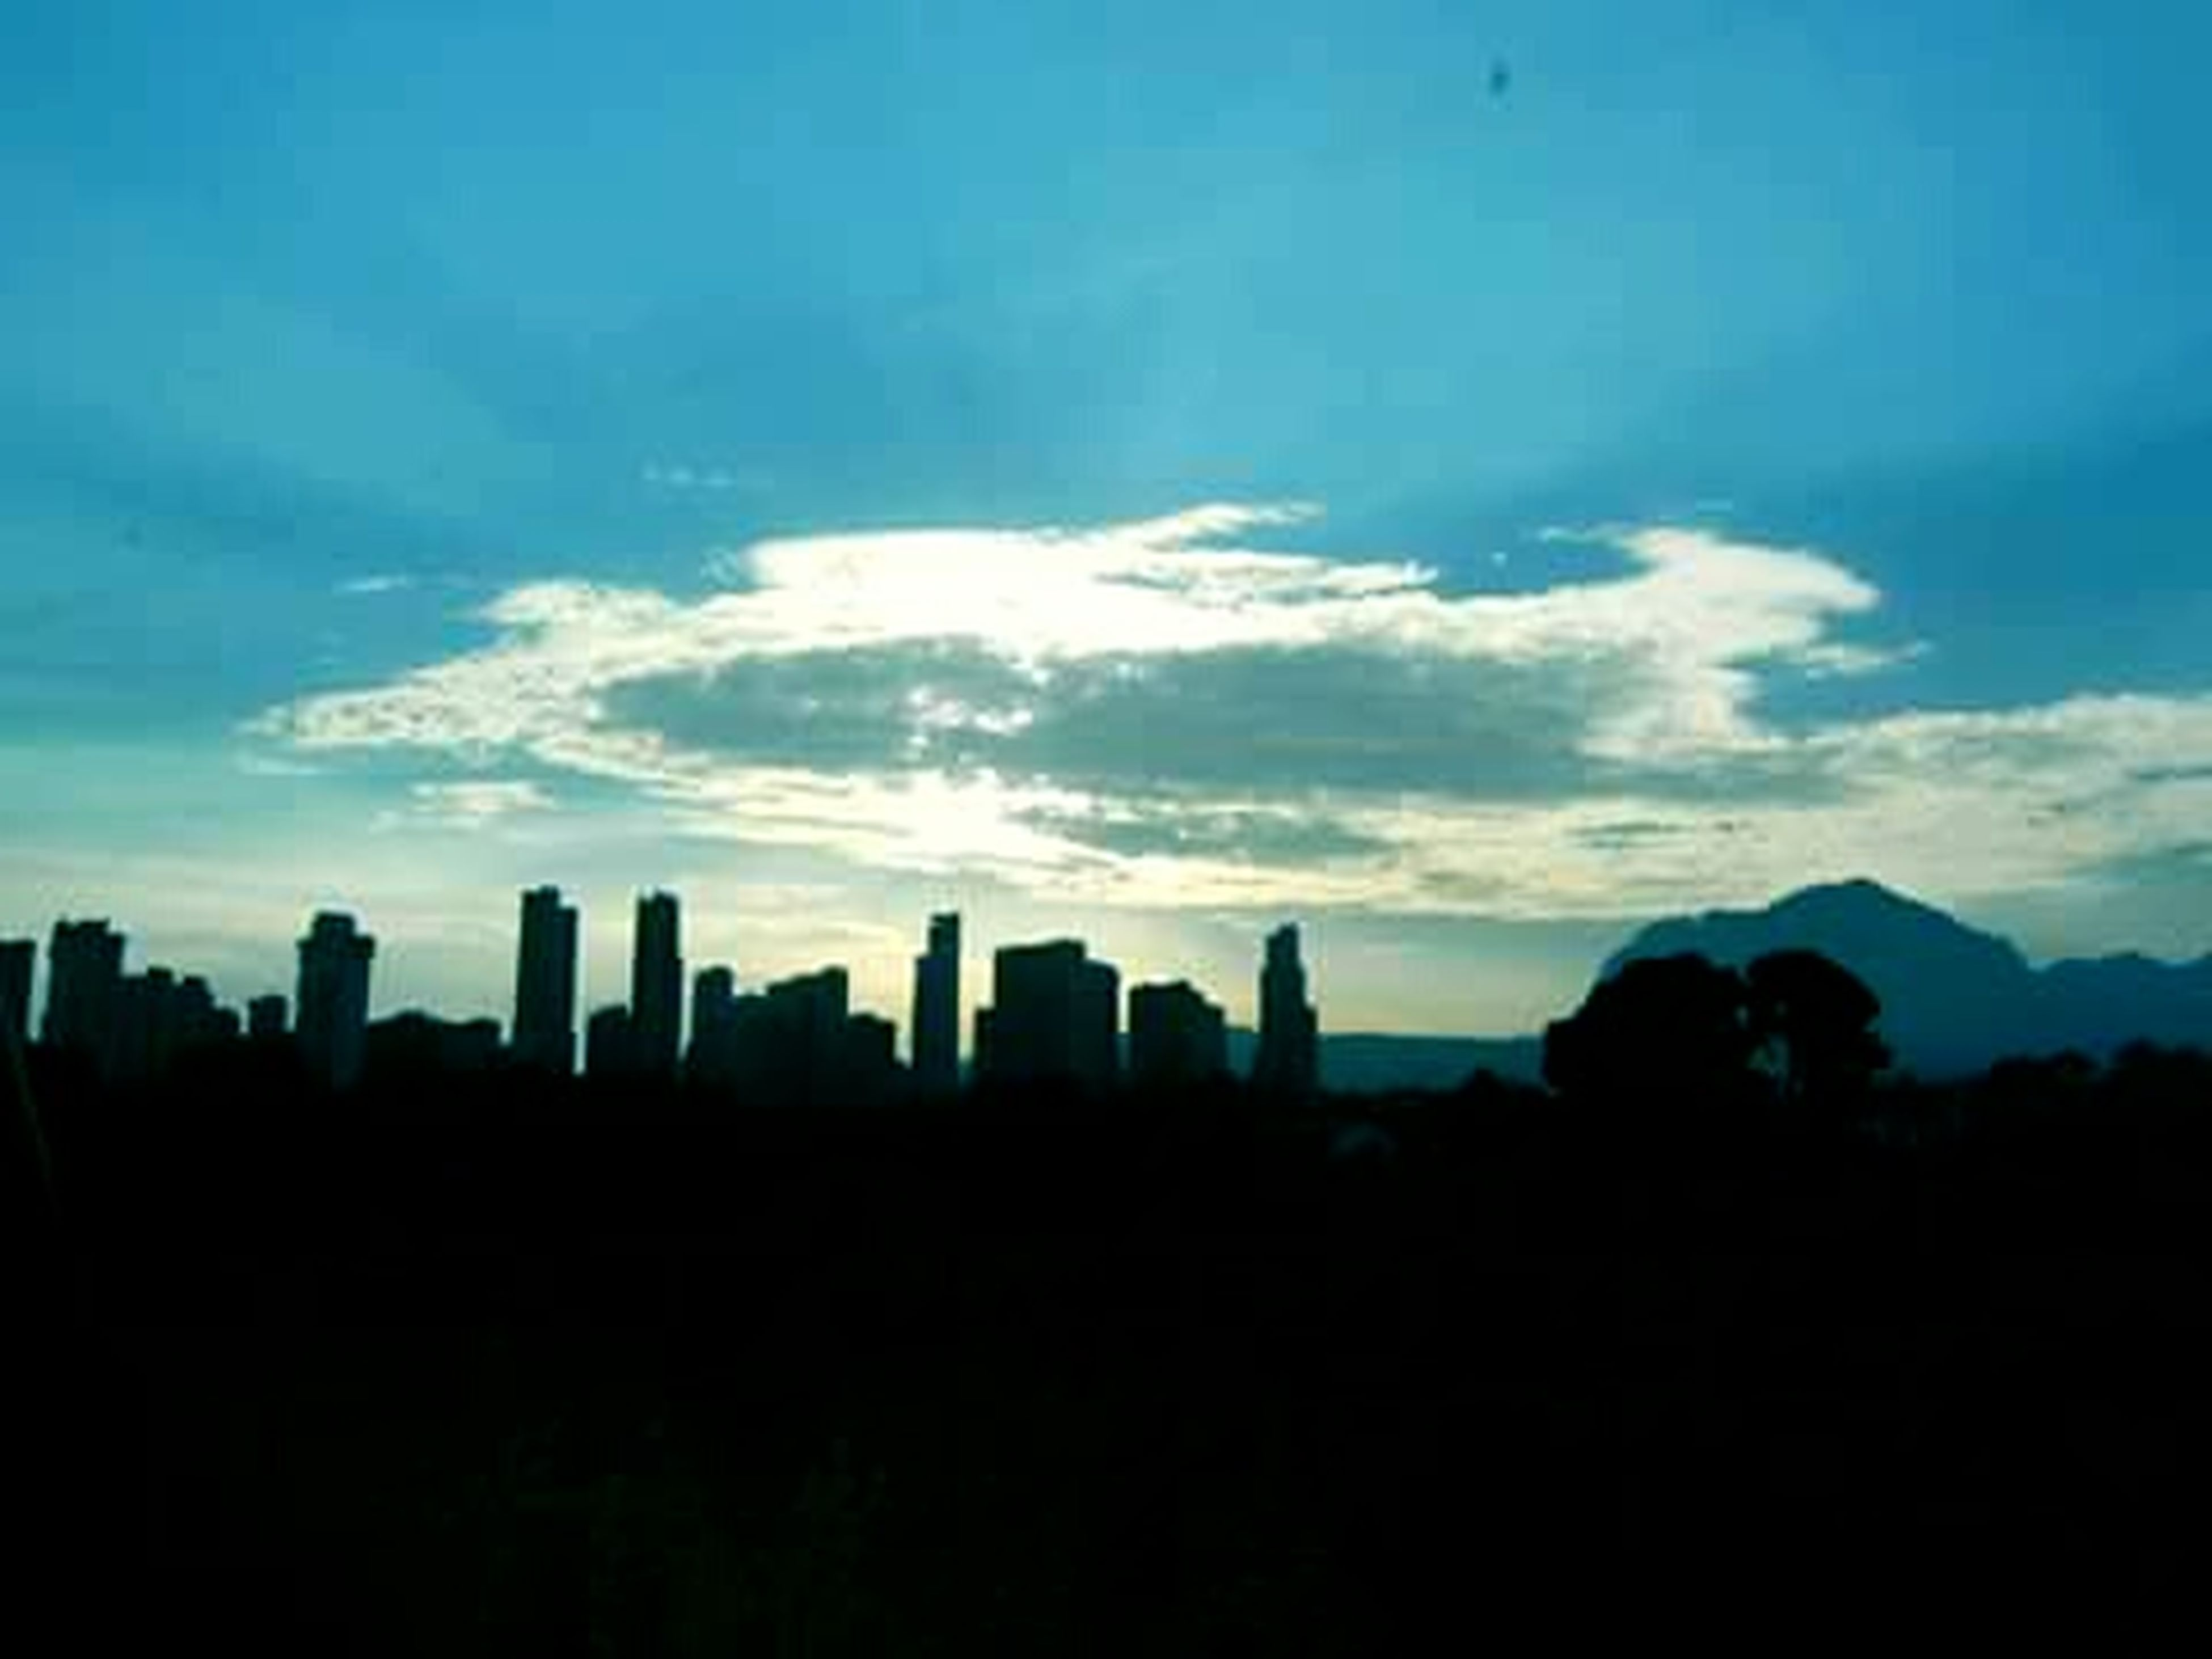 silhouette, building exterior, city, architecture, built structure, sky, cityscape, skyscraper, urban skyline, skyline, scenics, dusk, cloud - sky, cloud, outline, tree, copy space, outdoors, no people, nature